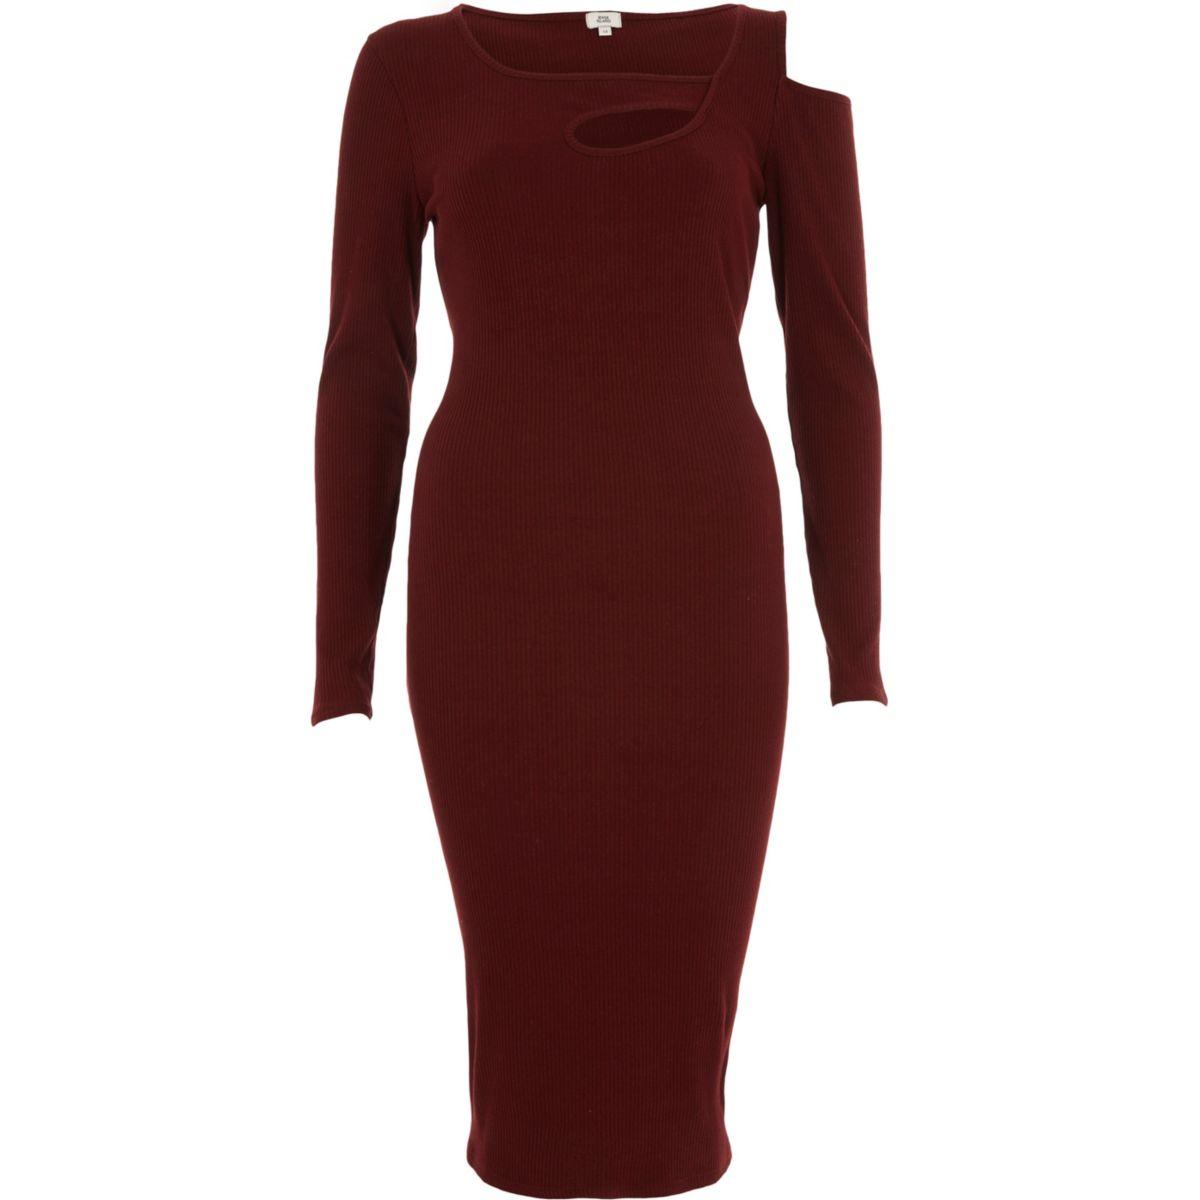 Asymmetrisches Bodycon-Kleid in Bordeaux